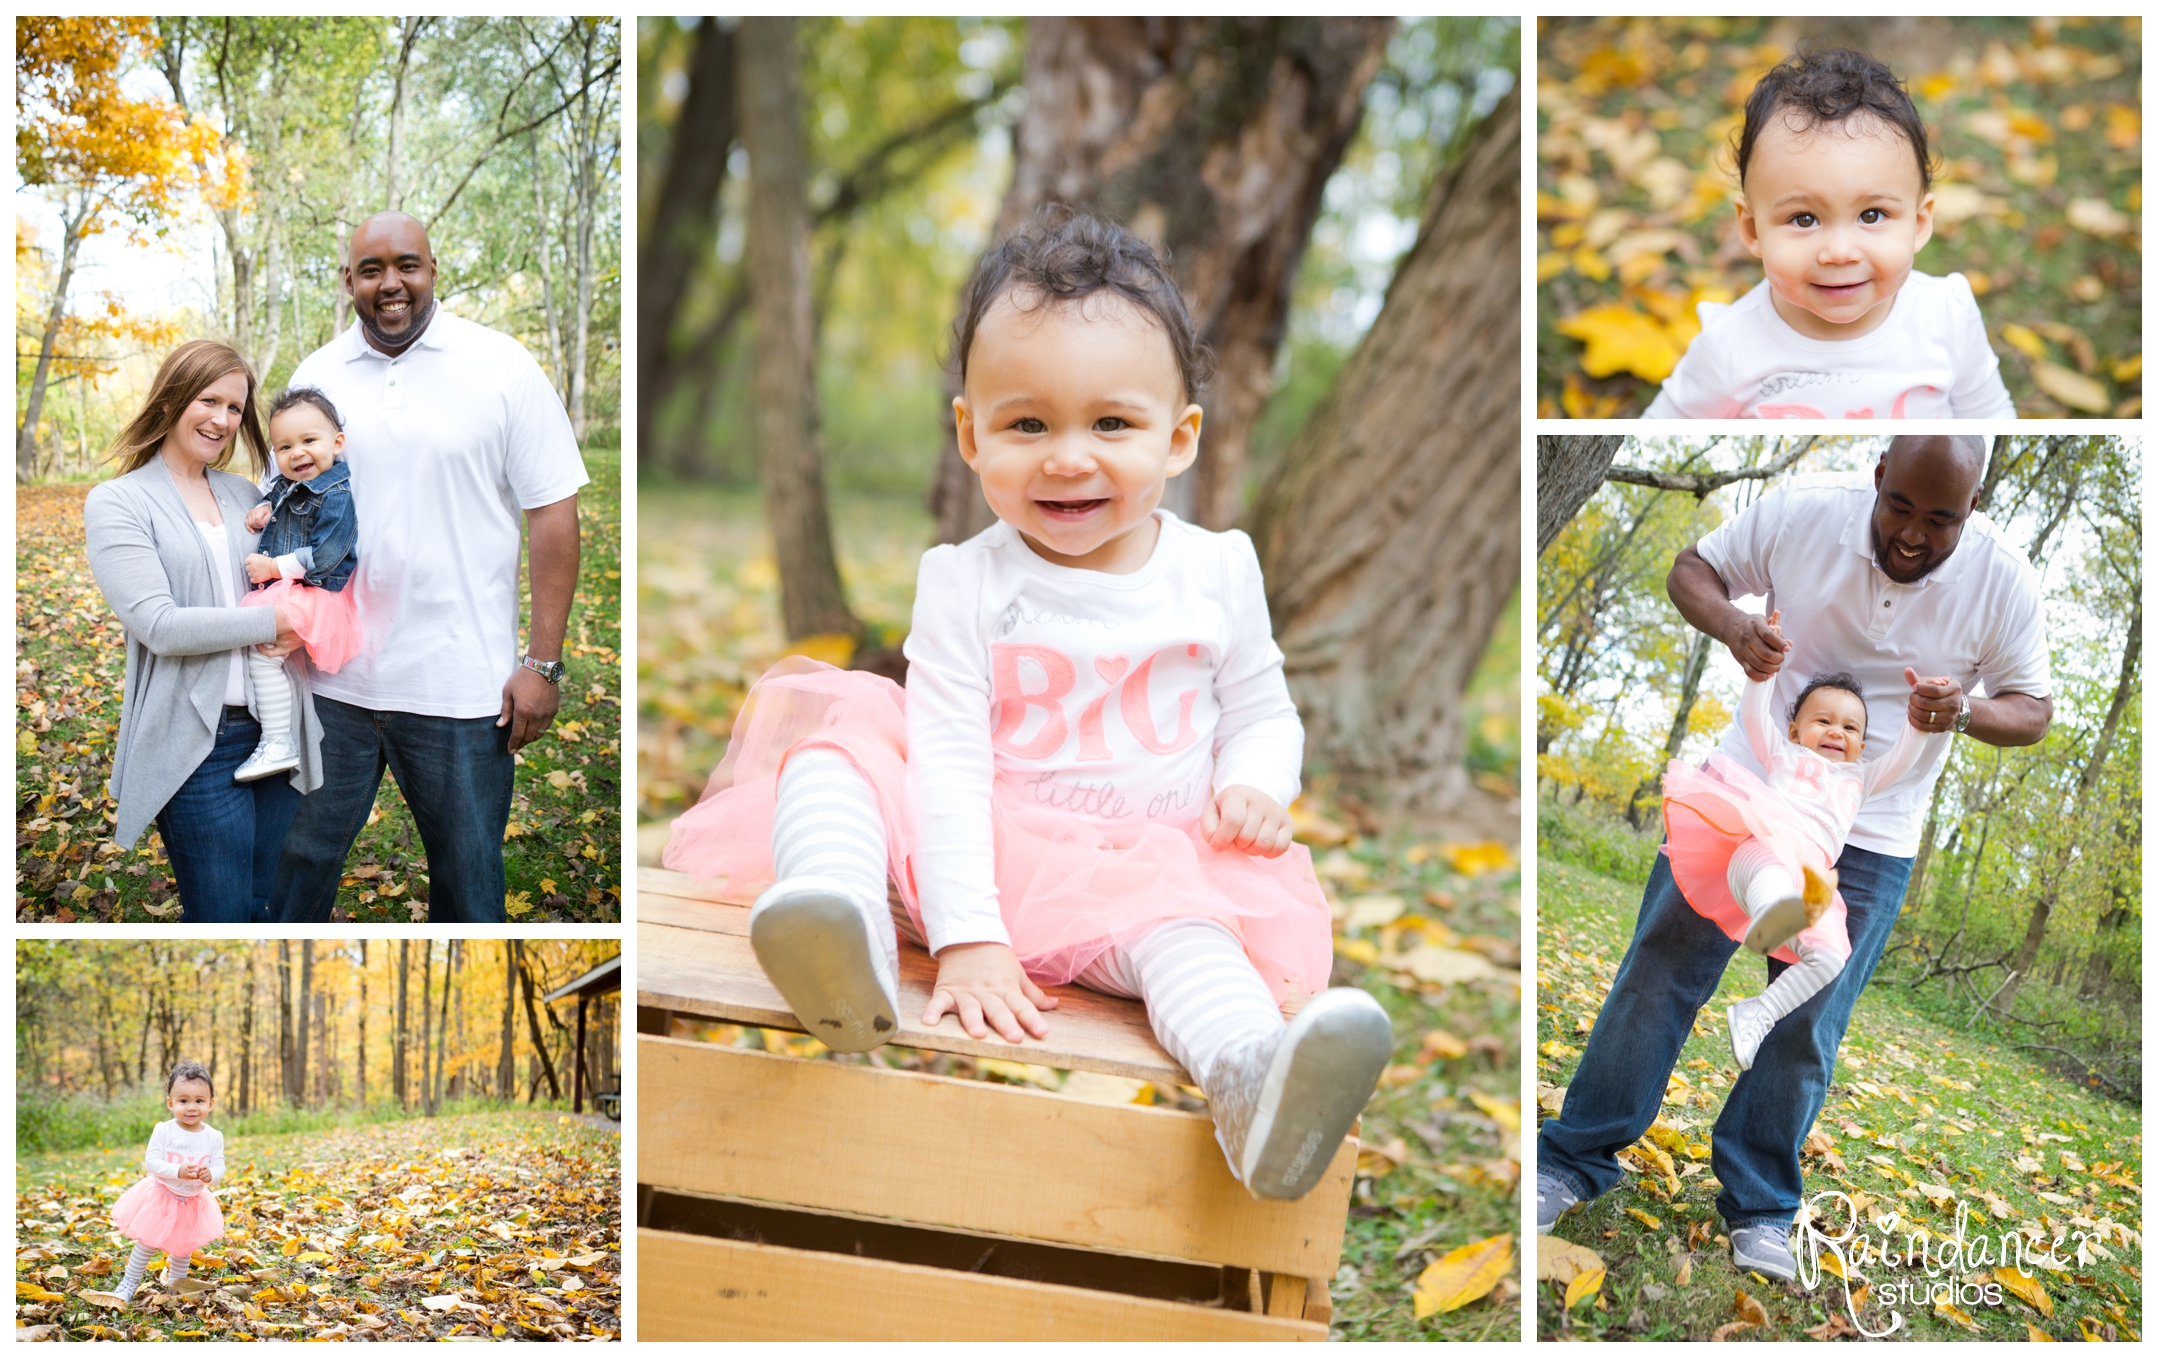 Indianapolis Family Photographer, Indianapolis Children Photographer, Brownsburg Family Photographer, Brownsburg Children Photographer, Indianapolis Baby Photographer